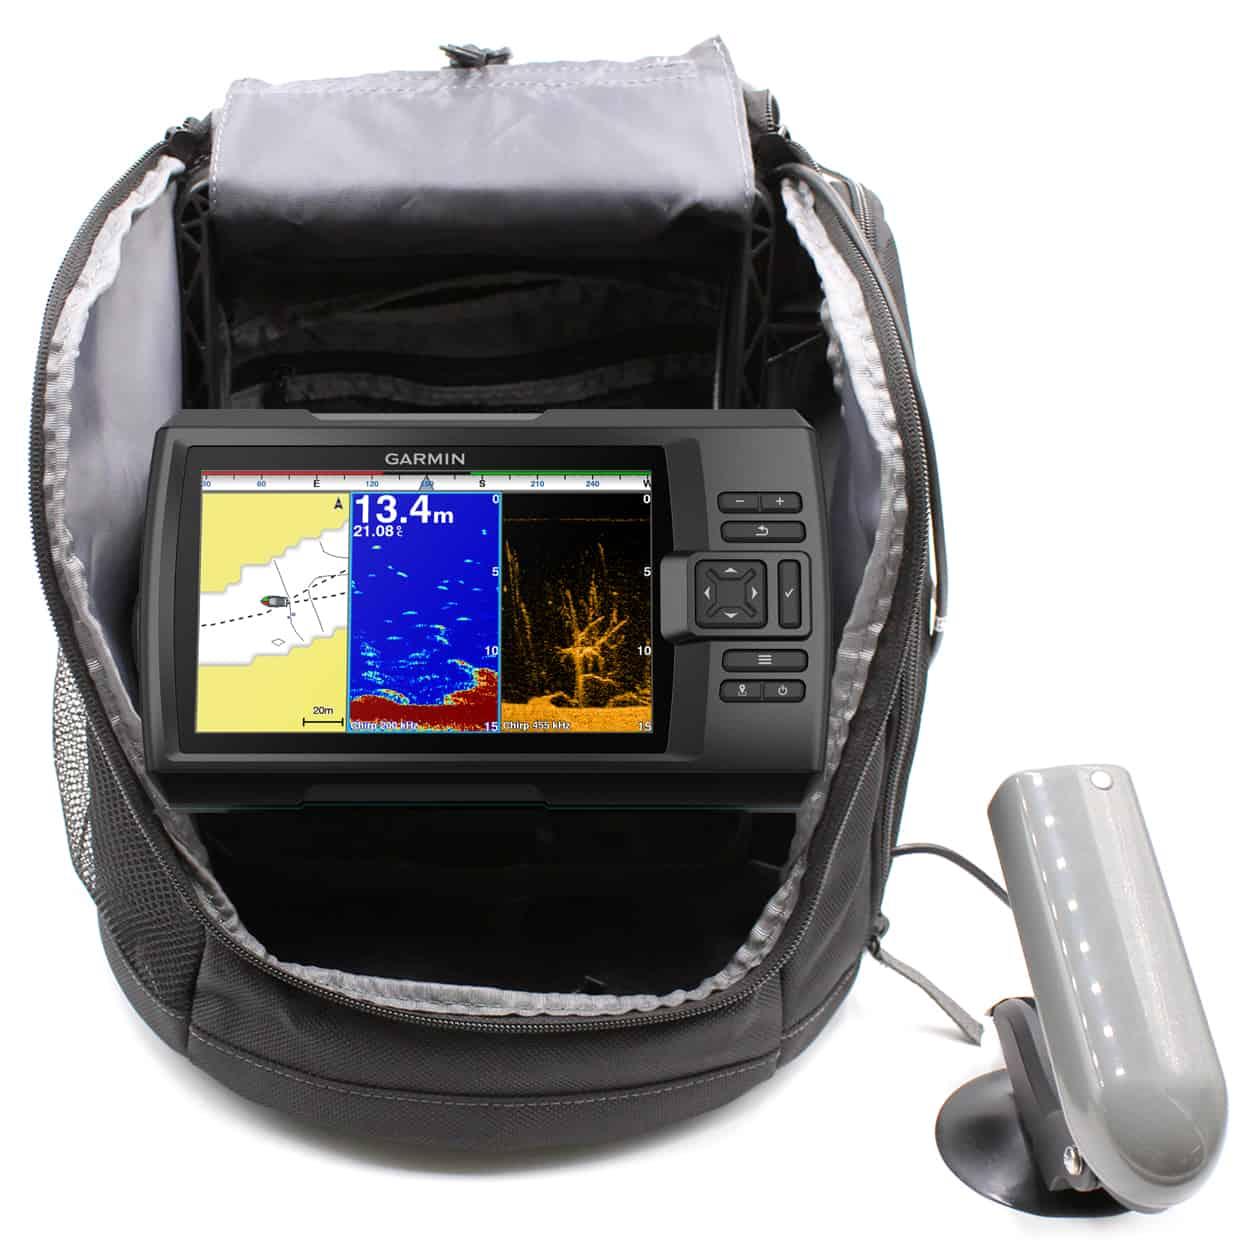 Striker plus 7sv portable fishfinder bundle outdoor for Garmin panoptix ice fishing